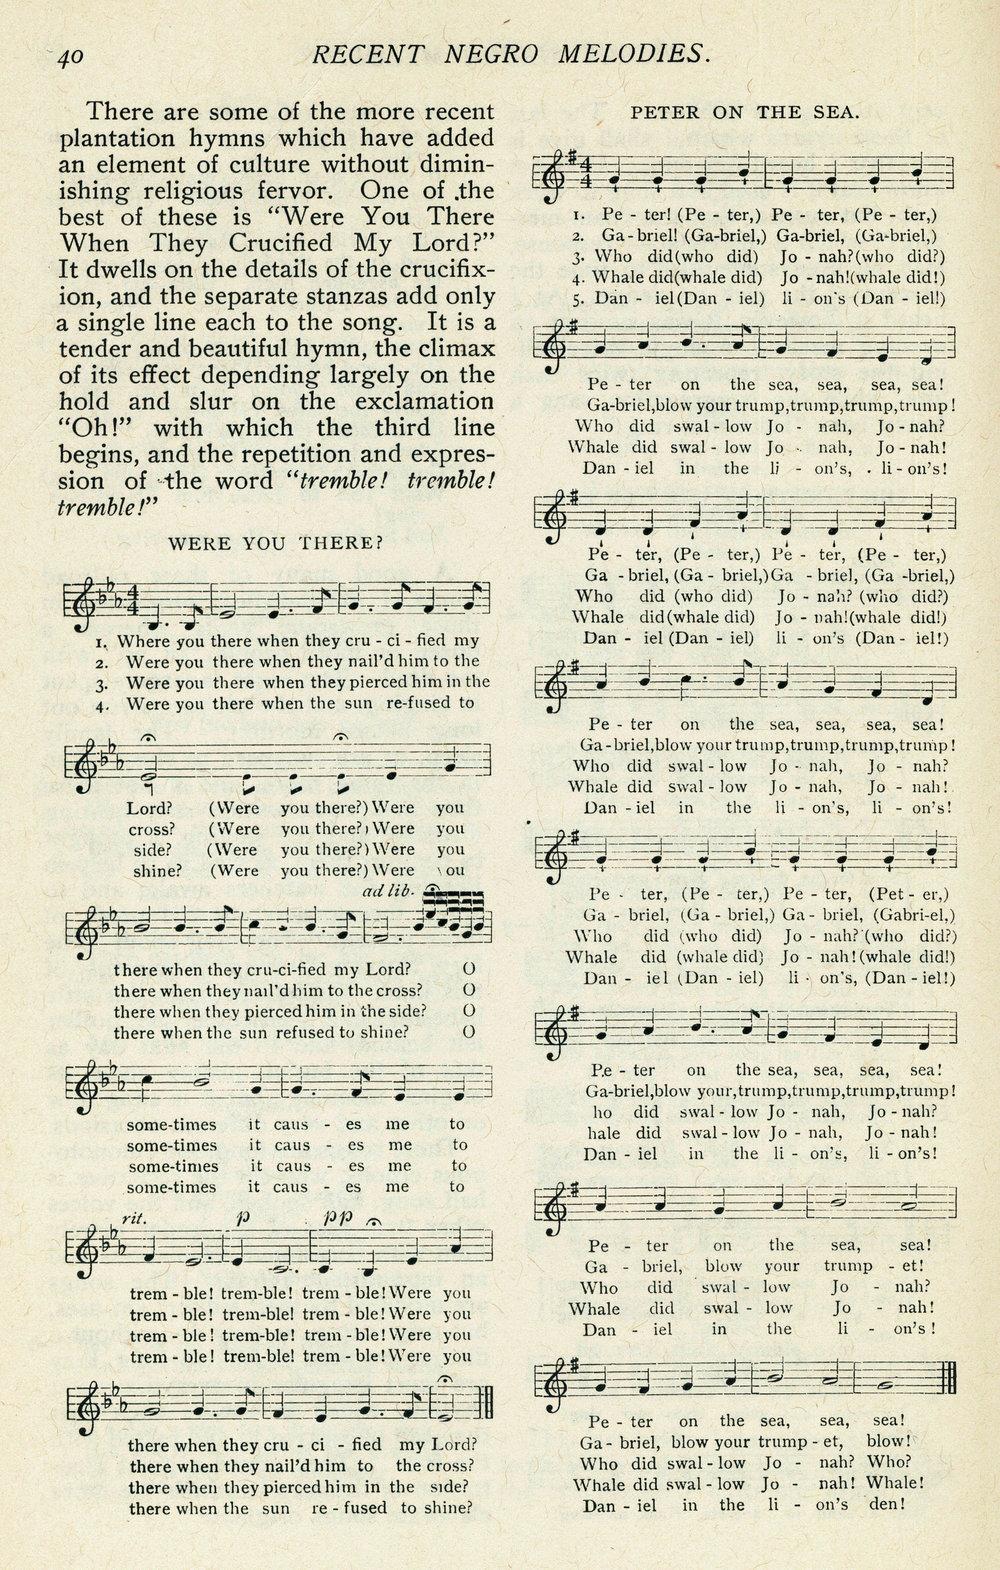 Fig. 6.  William E. Barton's  Old Plantation Hymns  (Boston: Lamson, Wolff and Co., 1899).